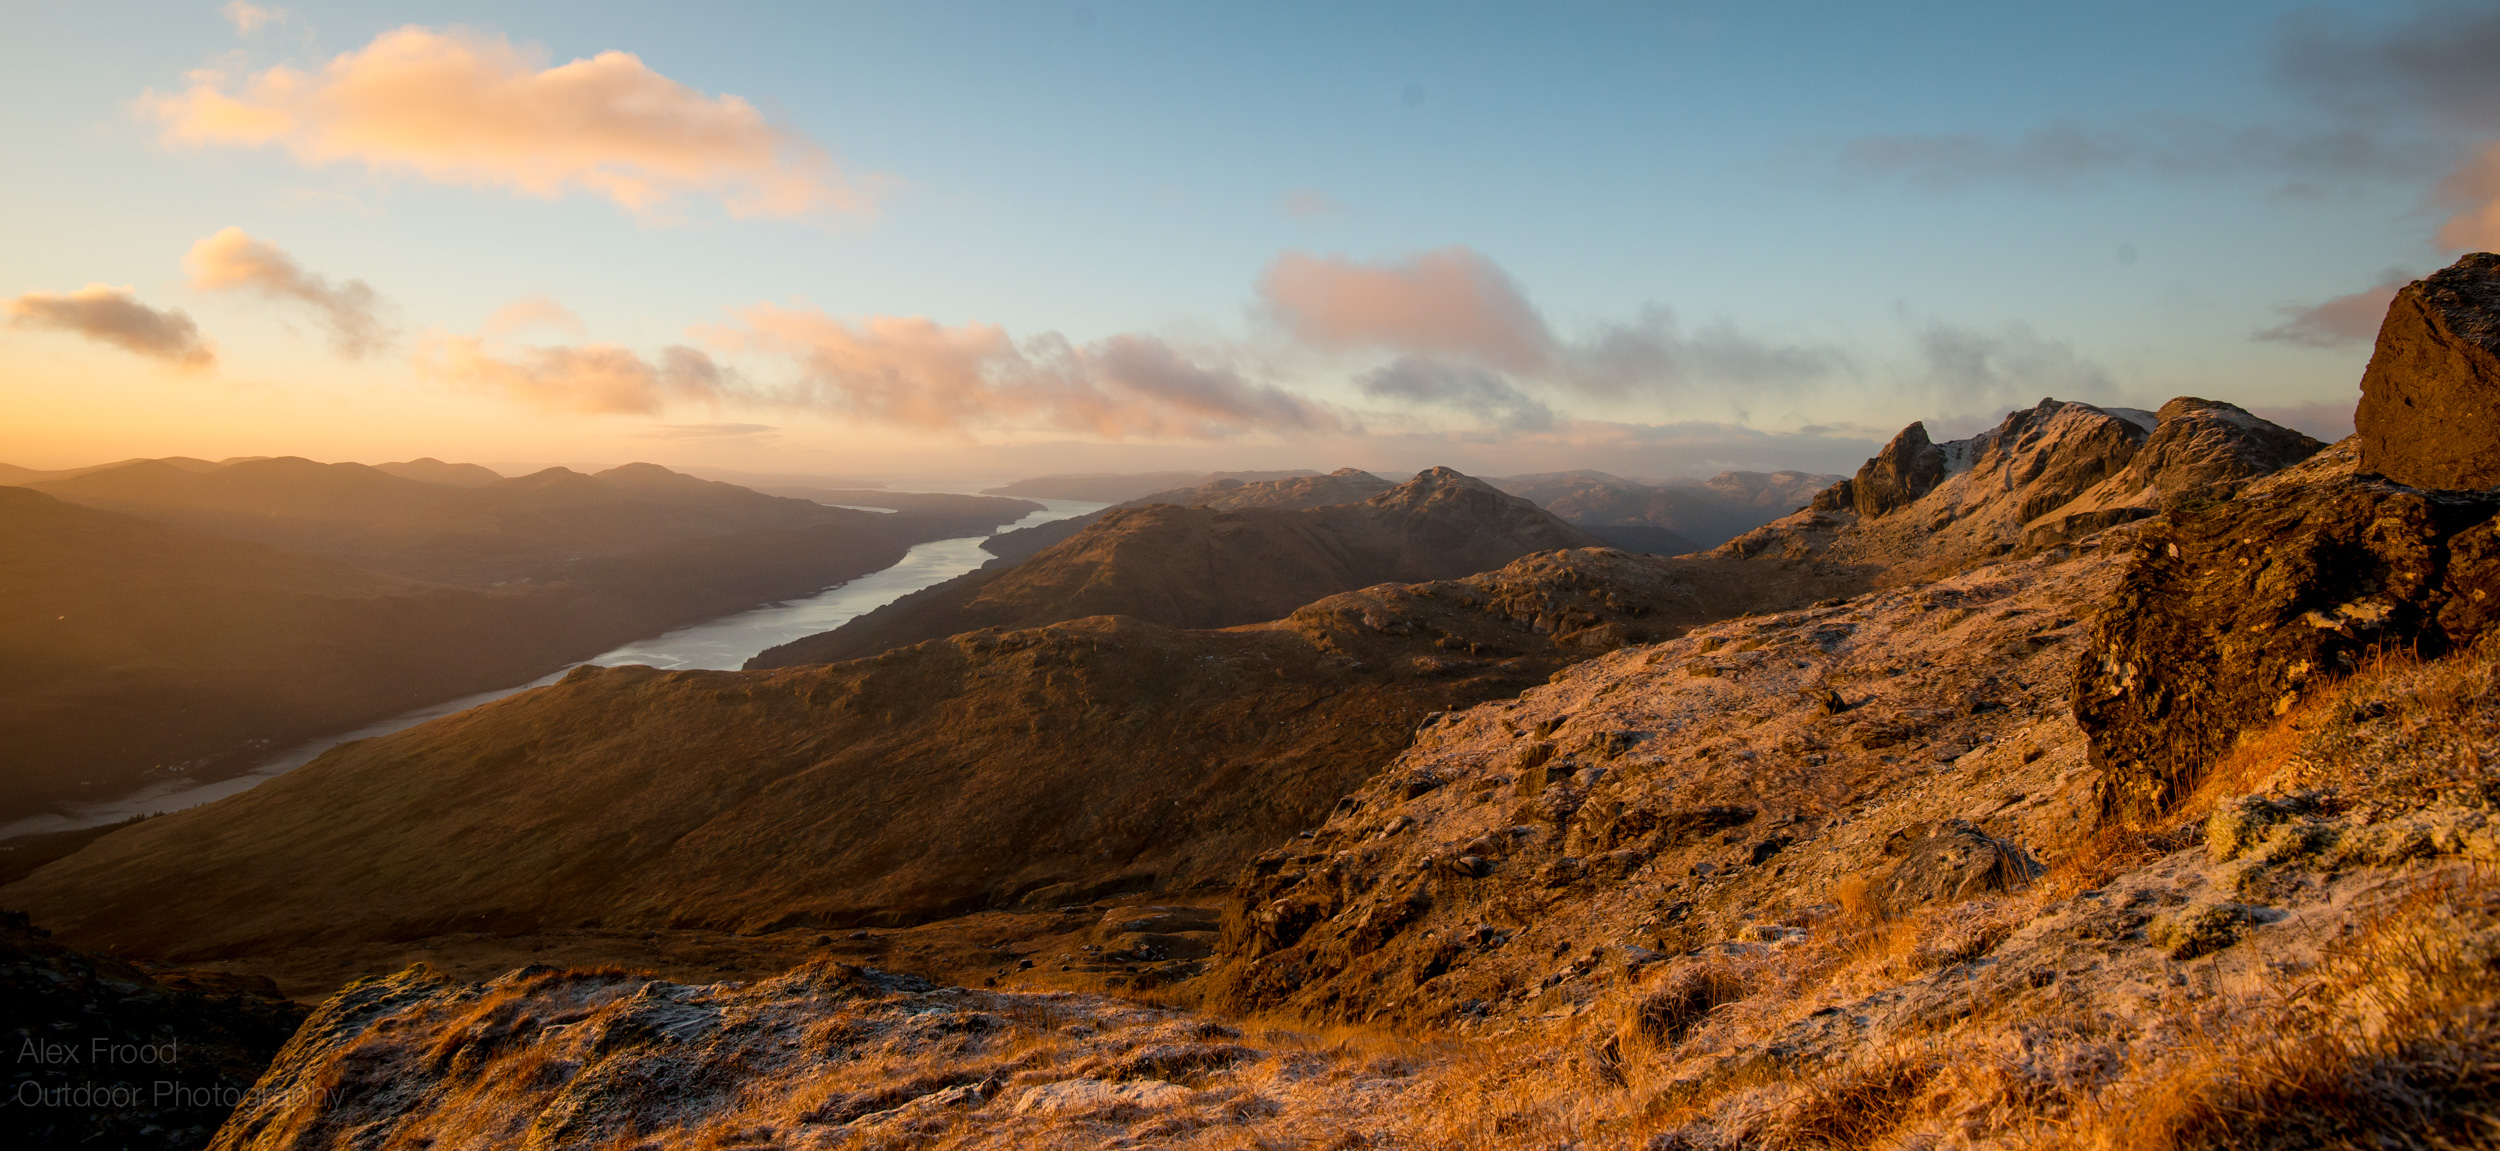 Sunrise The Cobbler & Loch Long